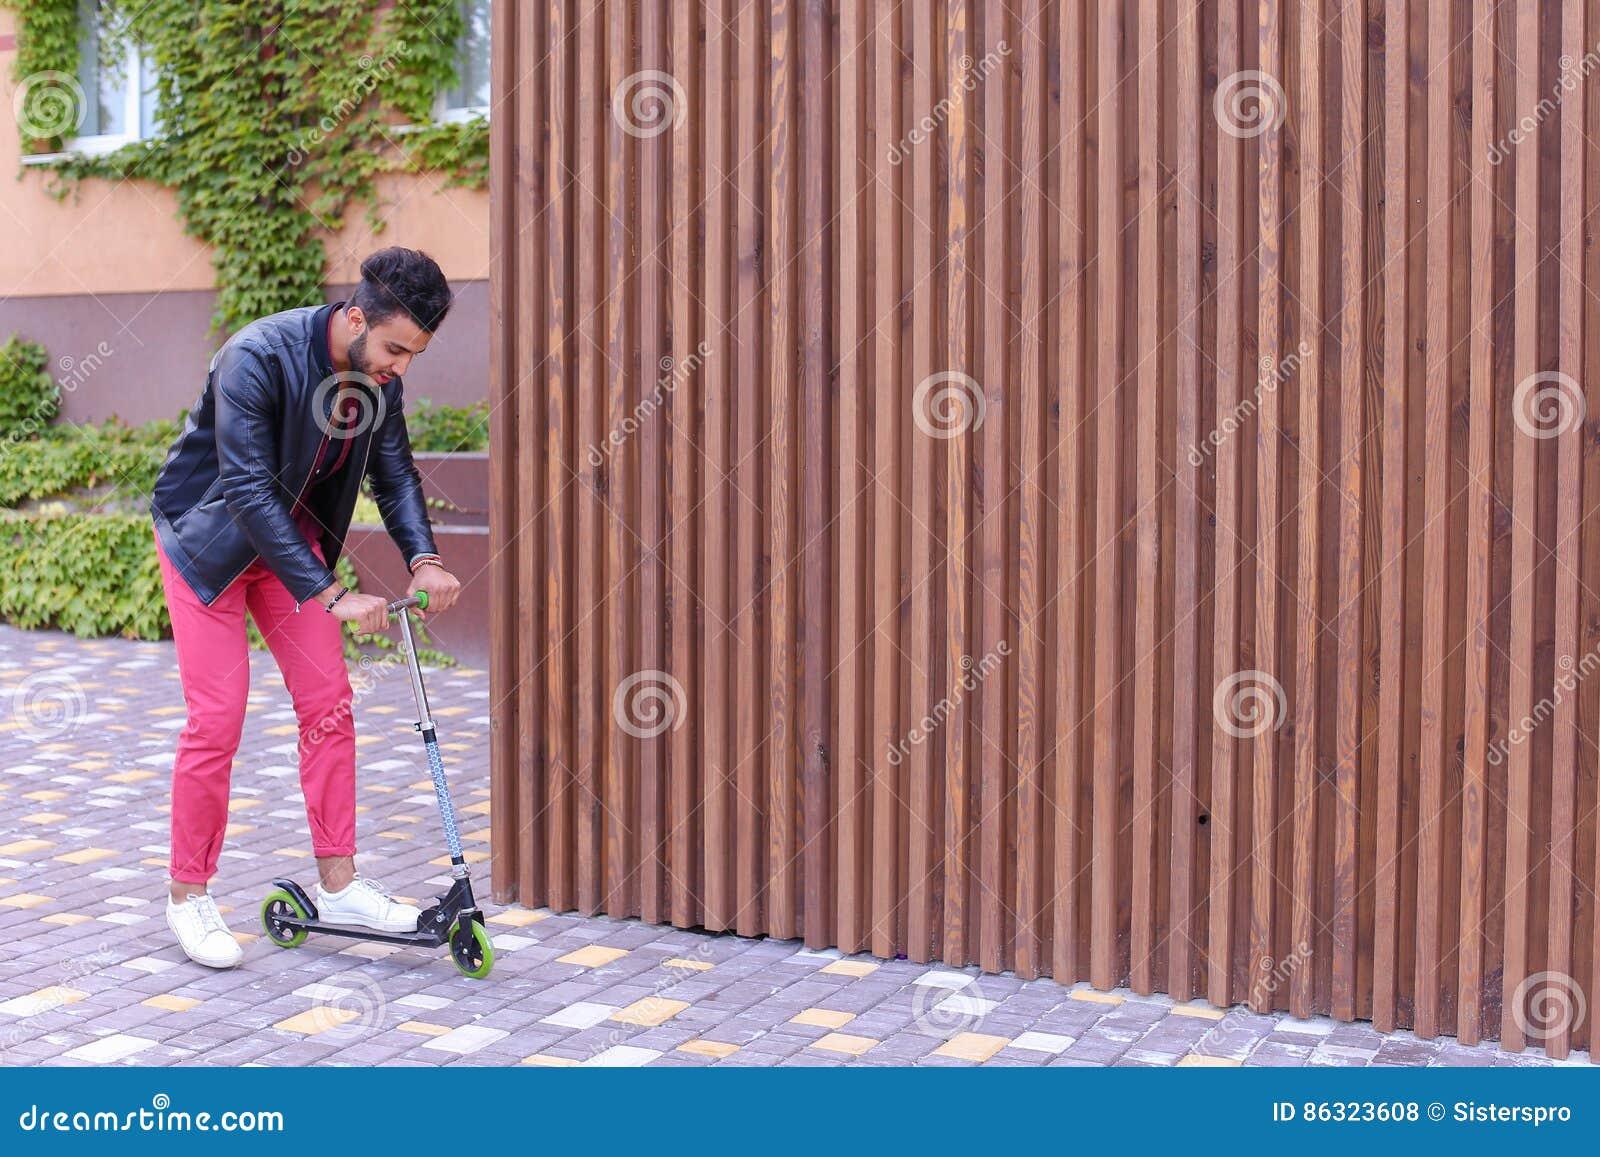 Yound maschile arabo affascinante Guy Rides Scooter, divertimento e